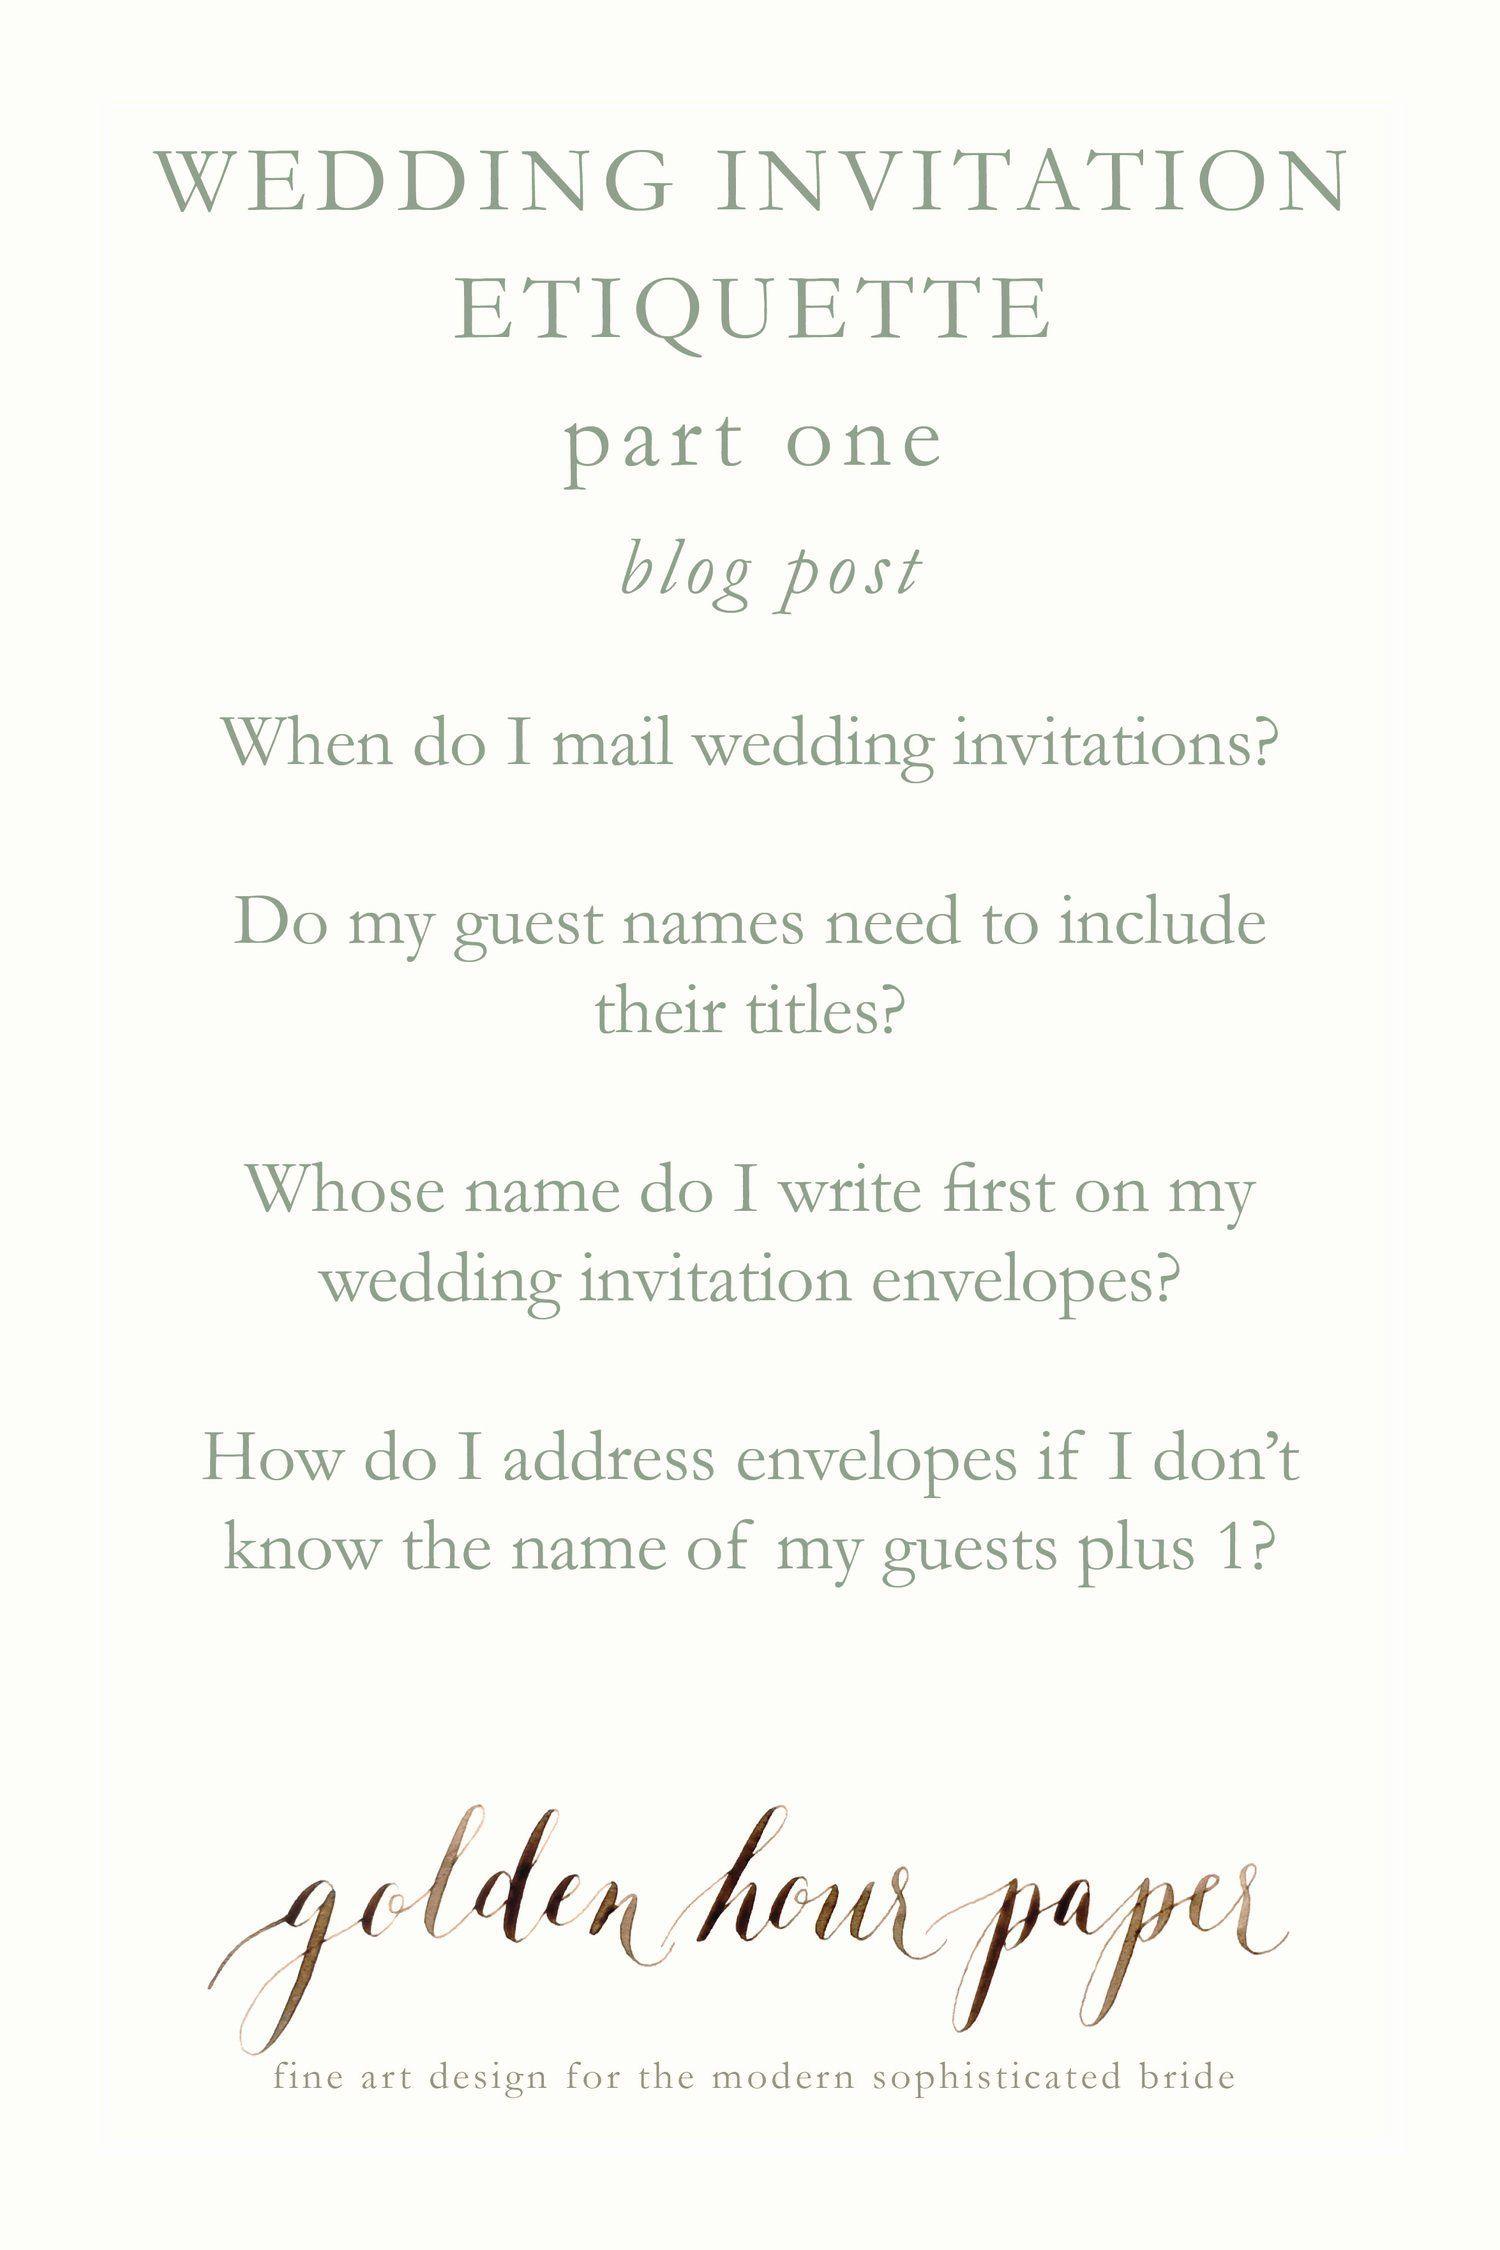 Wedding Invitation Plus One Elegant Rsvp Song Request Wording Wed Wedding Invitation Wording Templates Rsvp Wedding Cards Wedding Invitation Wording Examples